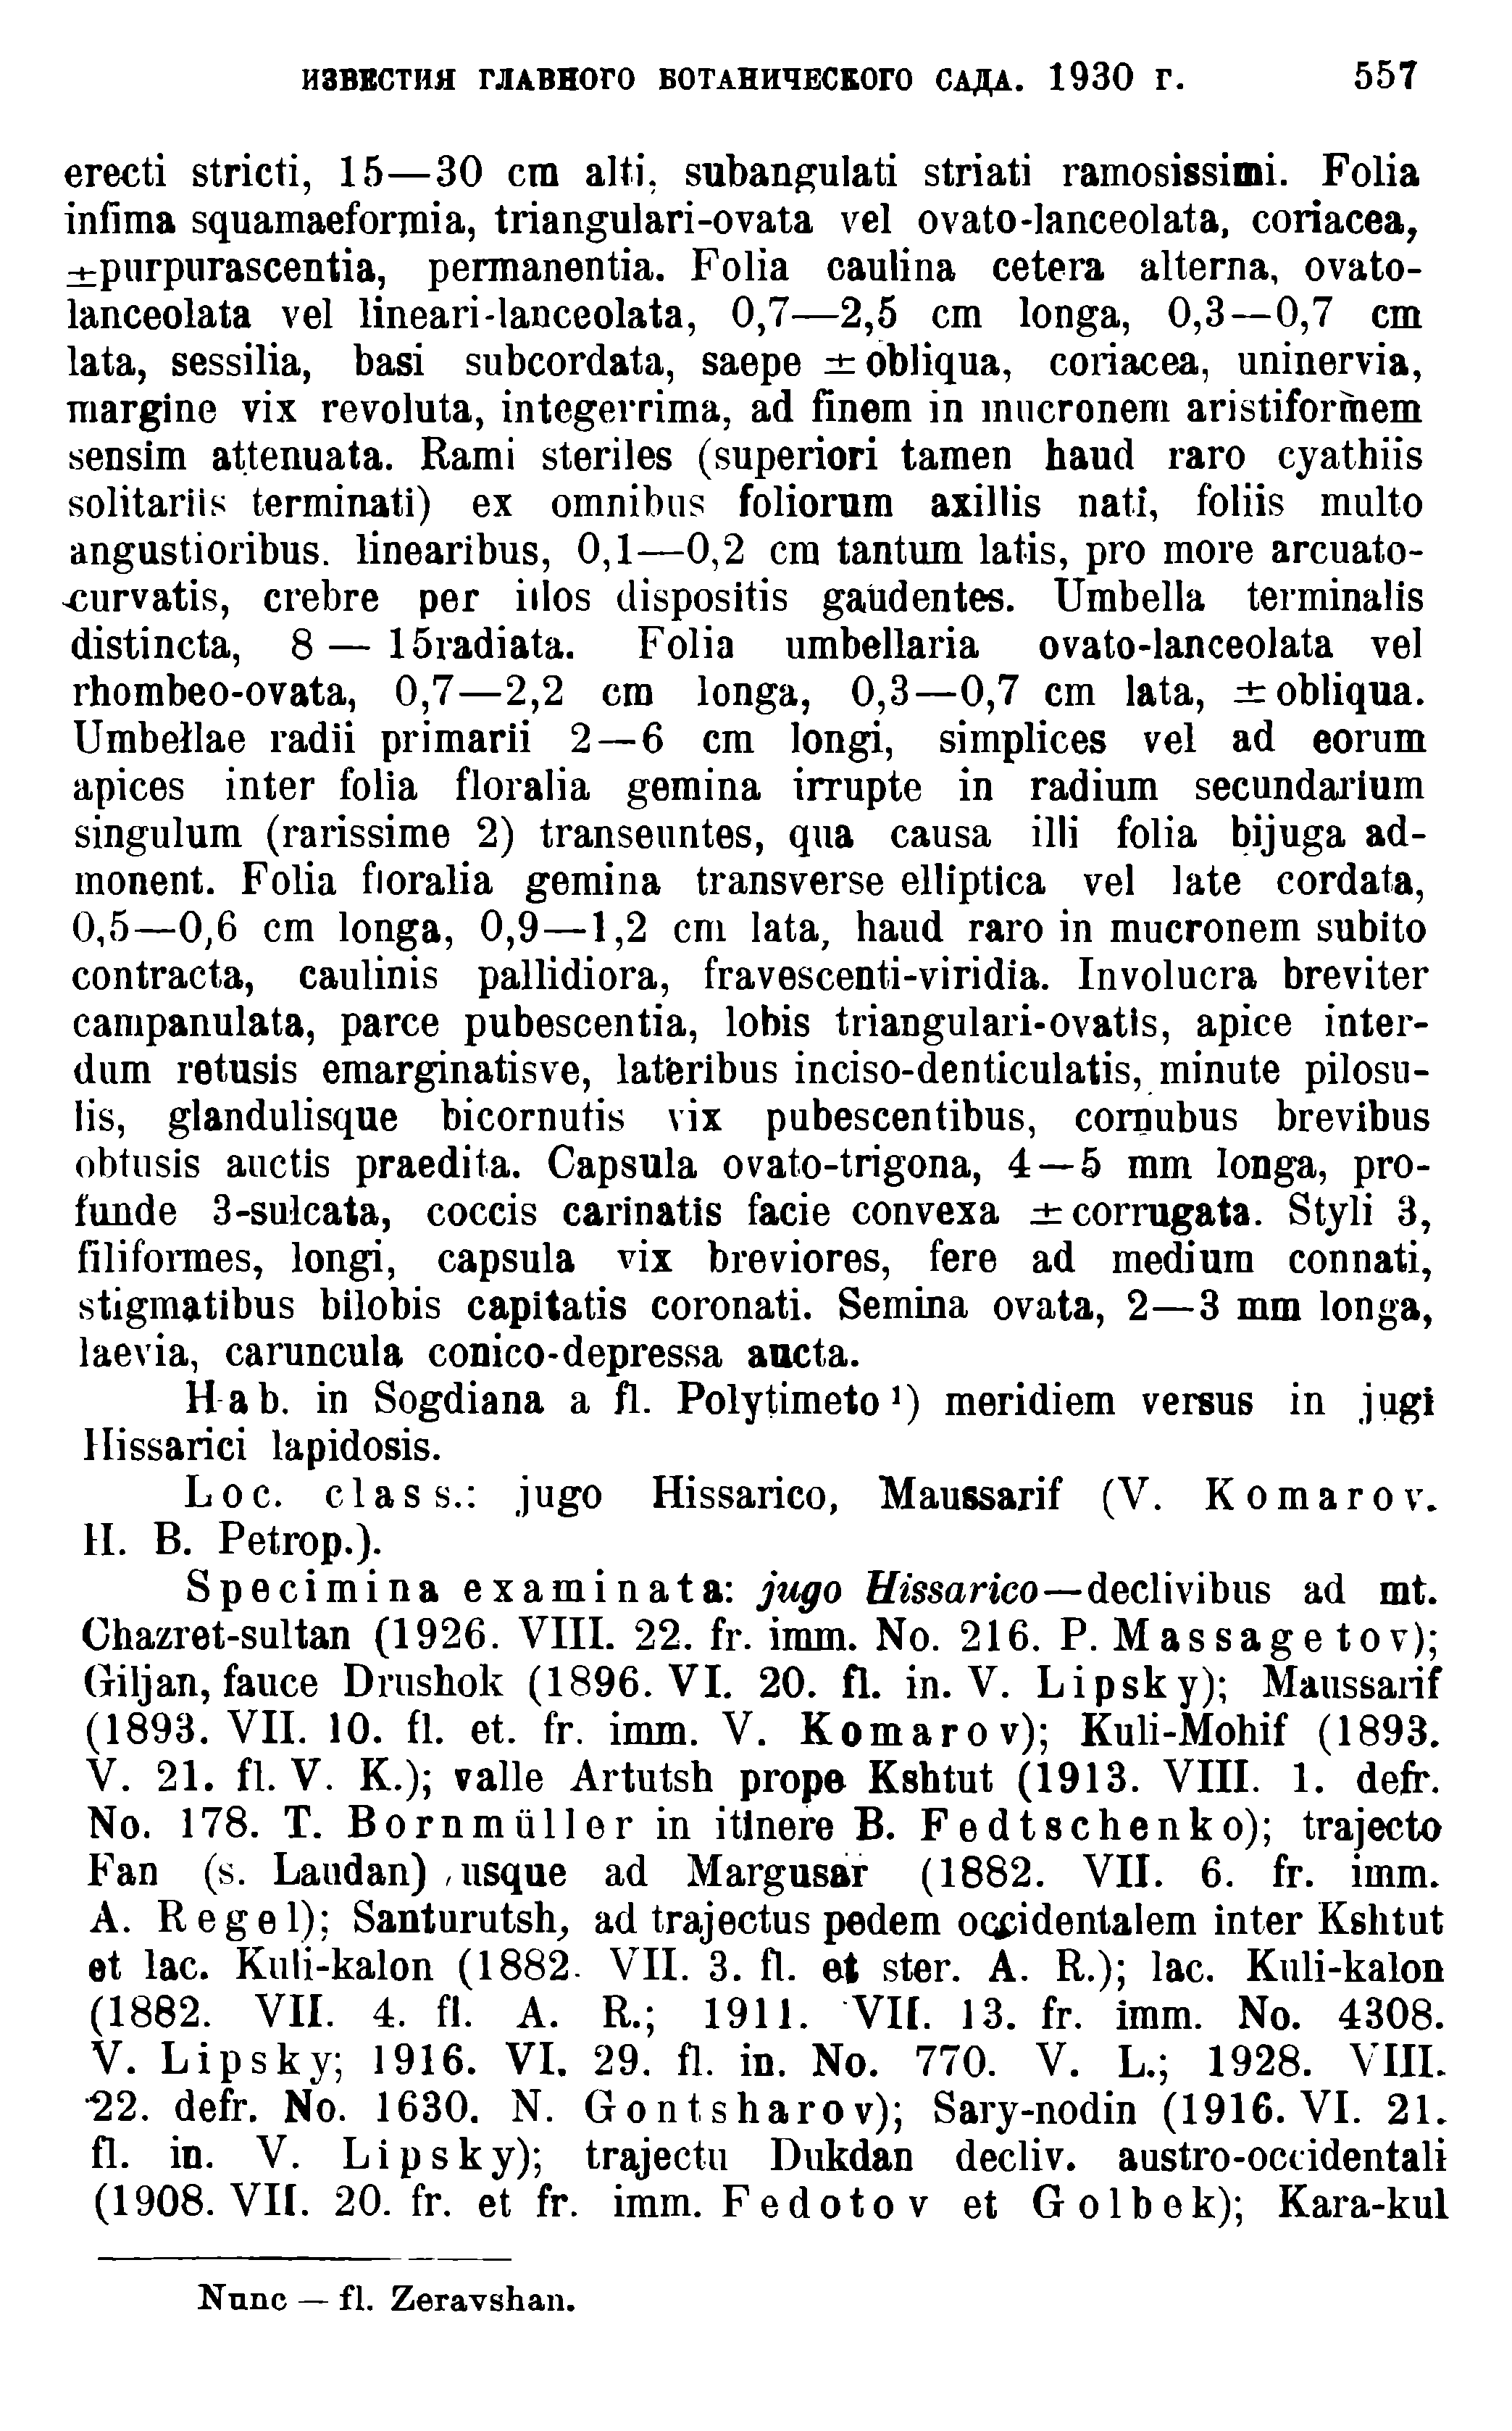 https://forum.plantarium.ru/misc.php?action=pun_attachment&item=30293&download=0